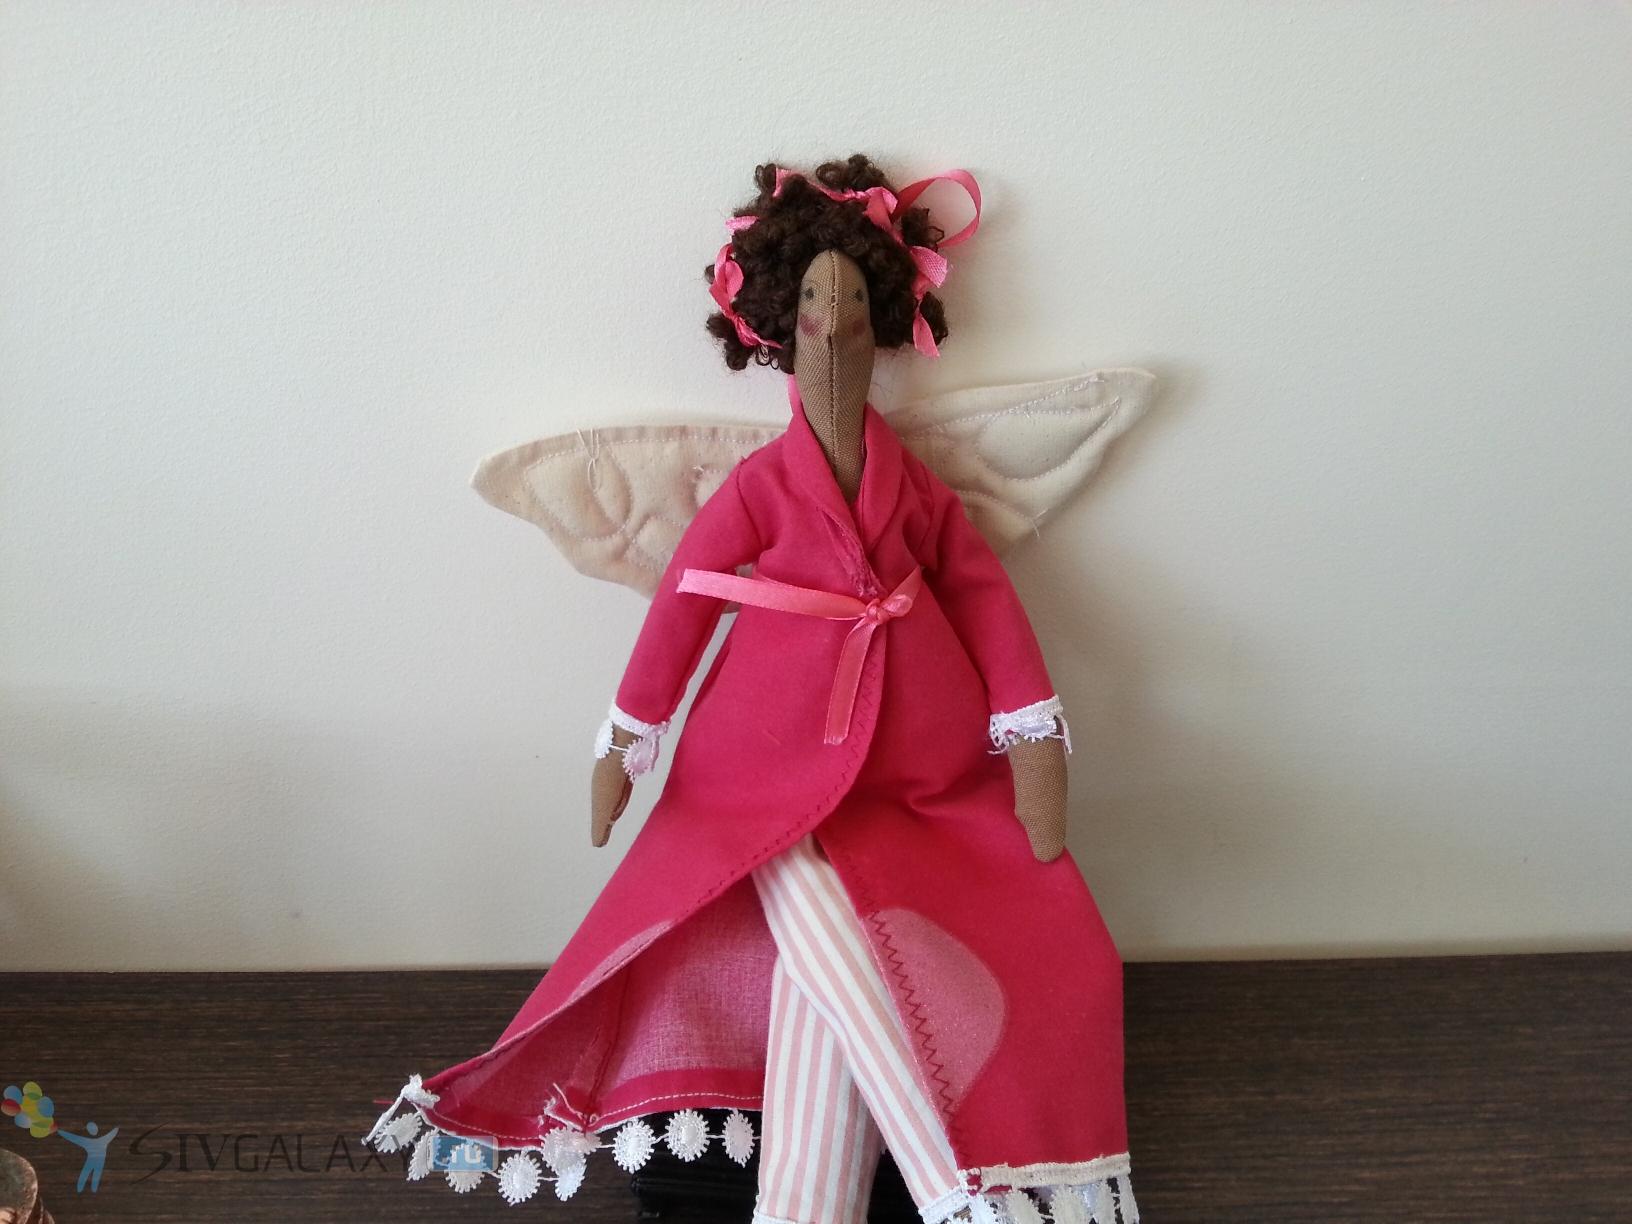 Пример фото в HDR c Samsung Galaxy S3 - кукла